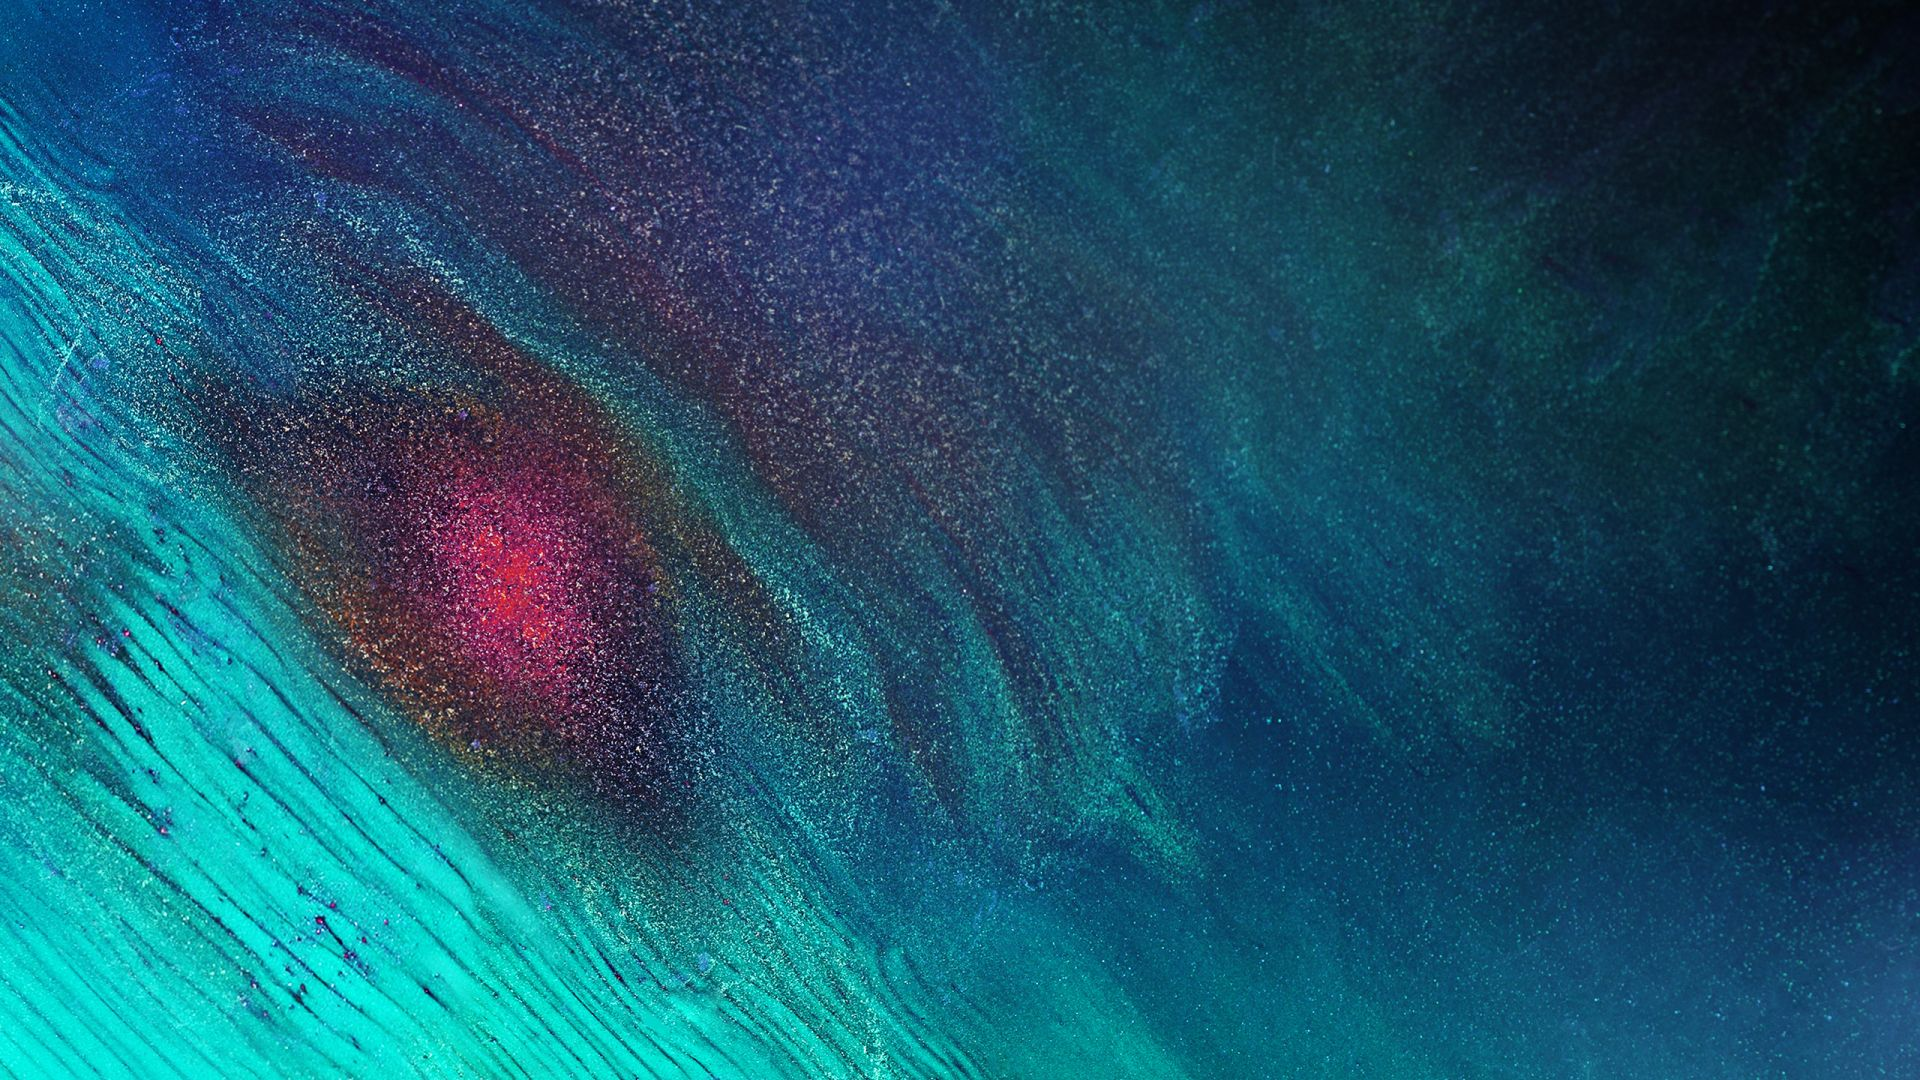 Ultra Hd Galaxy Laptop Wallpapers Top Free Ultra Hd Galaxy Laptop Backgrounds Wallpaperaccess